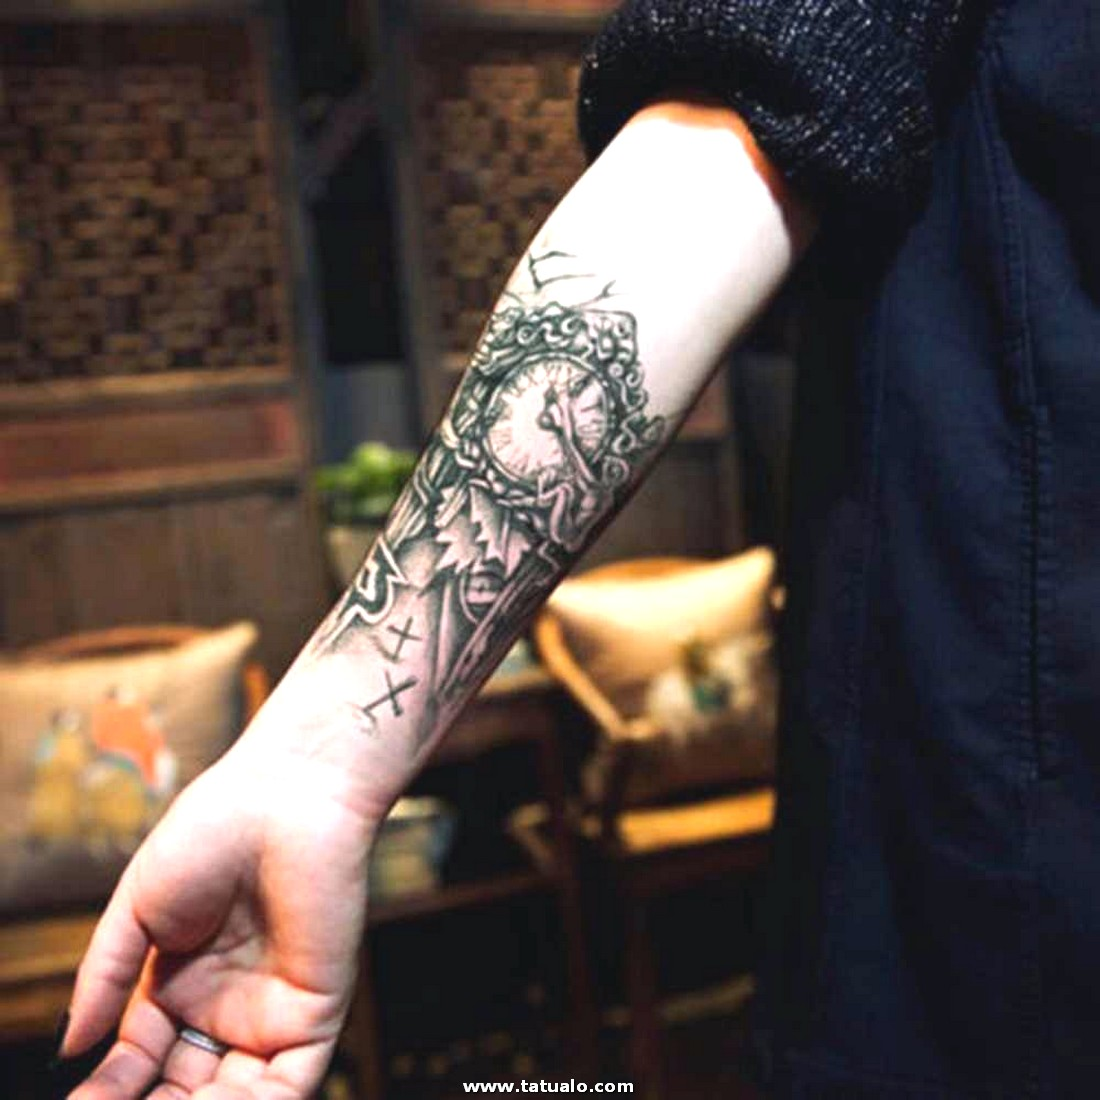 19 12 Cm Negro Reloj Tatuajes Para Hombres Mec Nico Grande Temporal Brazo Tatuaje Pegatina Mujeres.jpg Q50